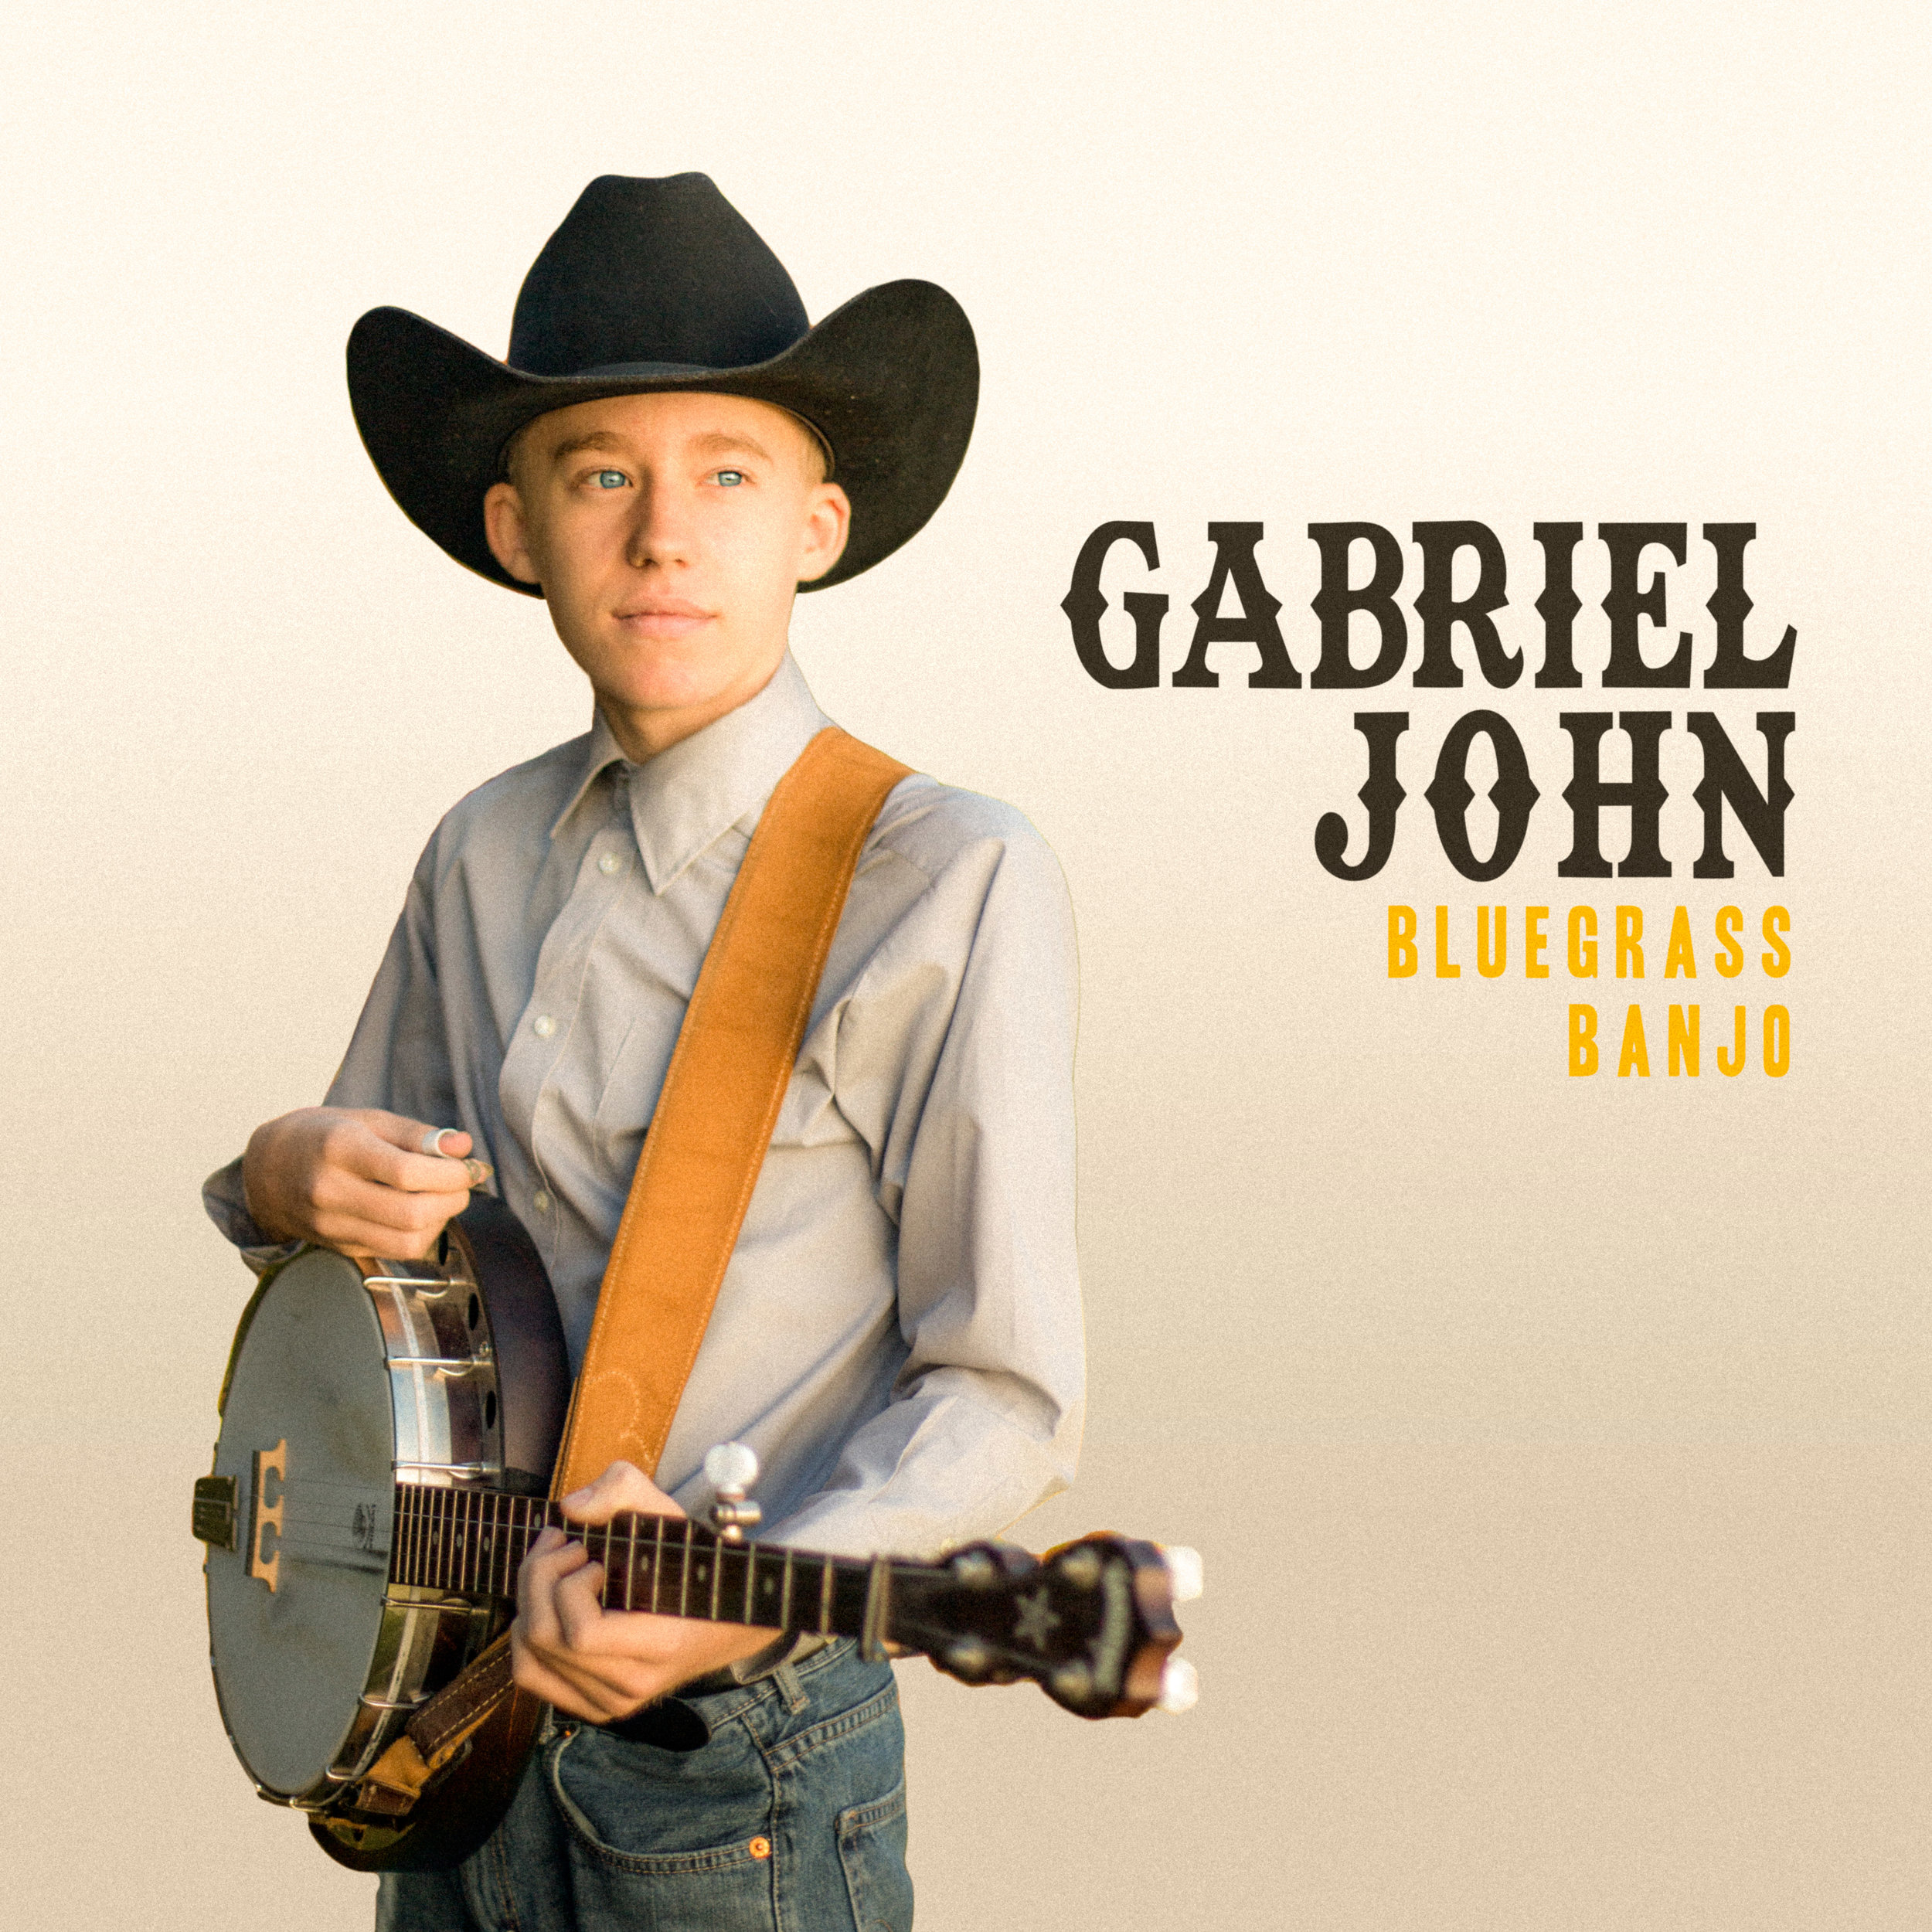 Gabriel John - Concept album artwork for bluegrass banjo player, Gabriel John.